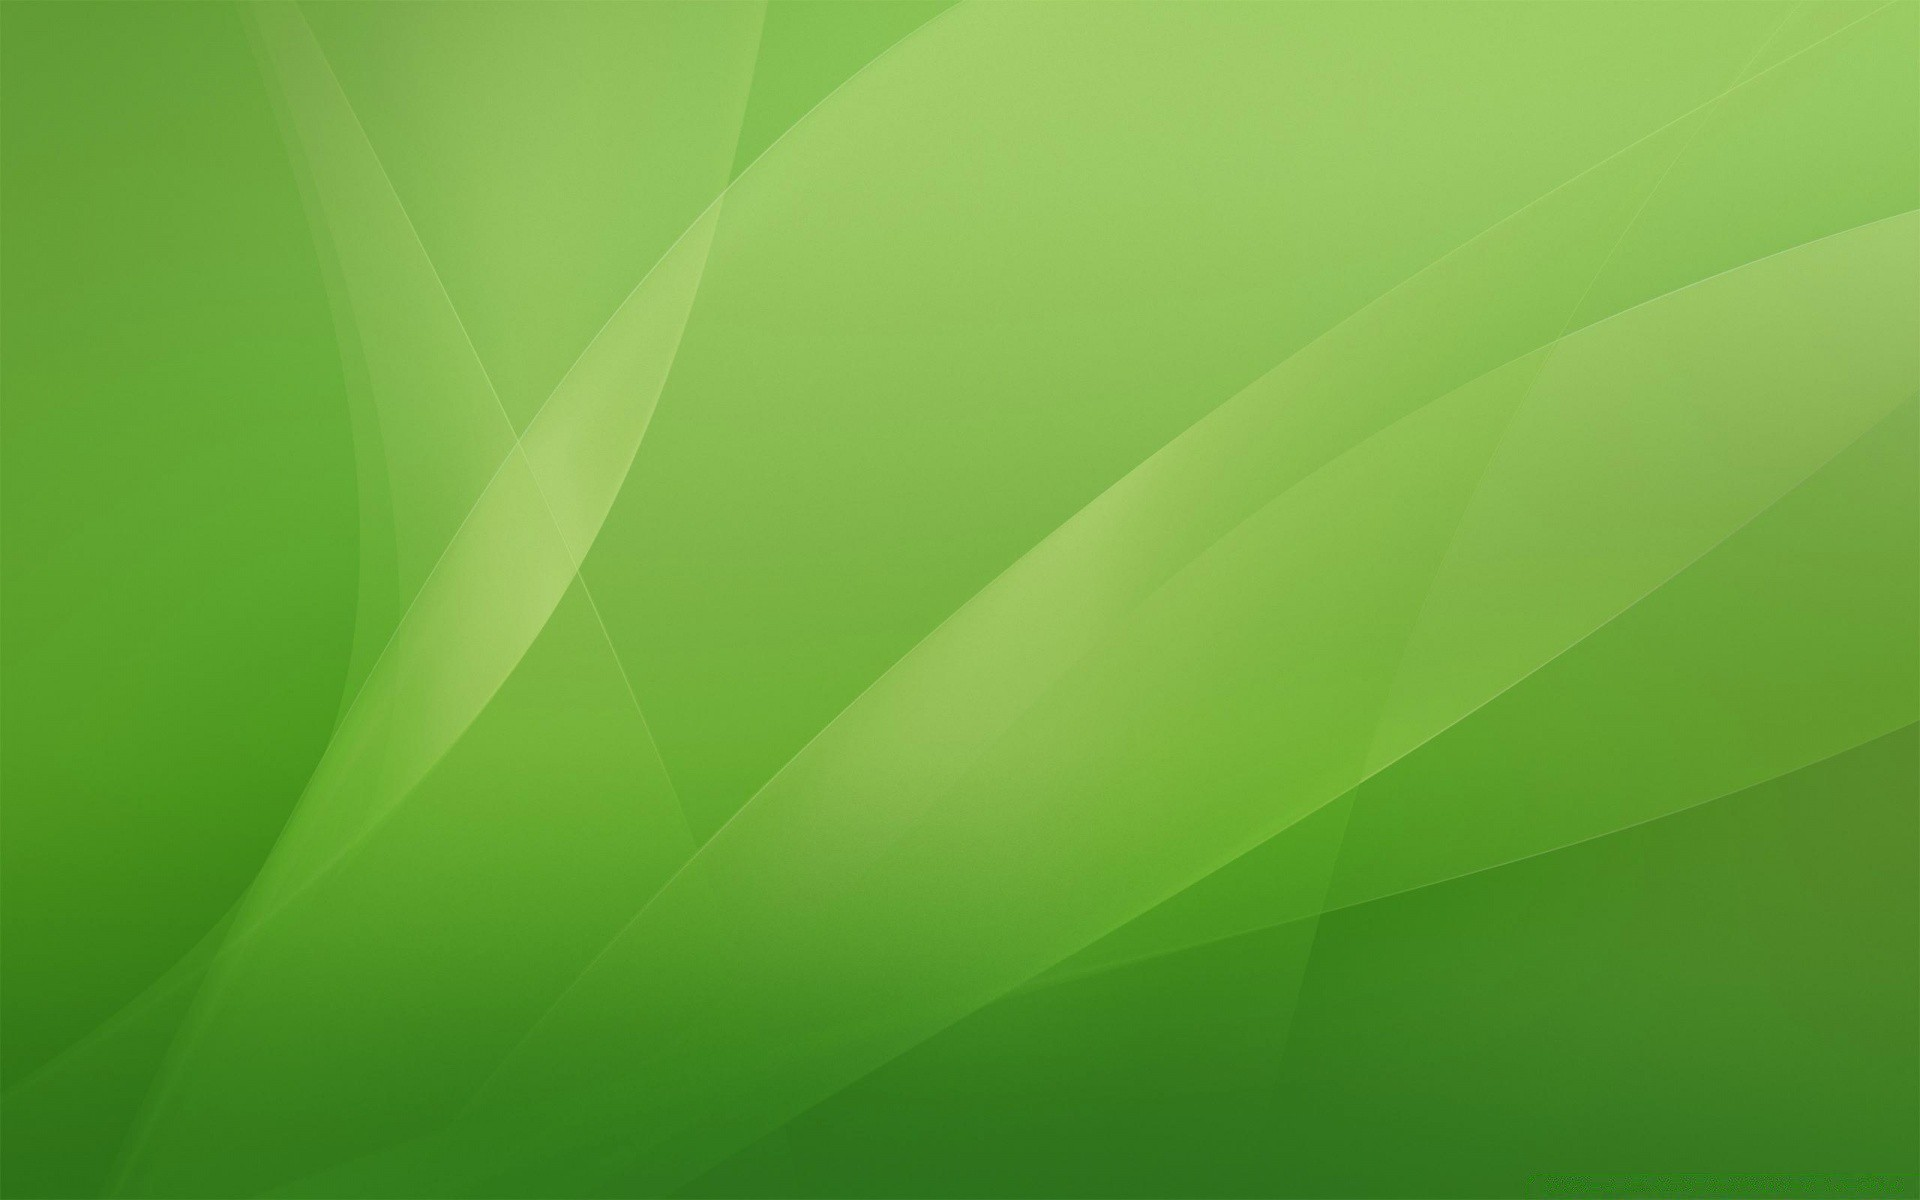 Младенцами, картинки зеленый фон для презентации